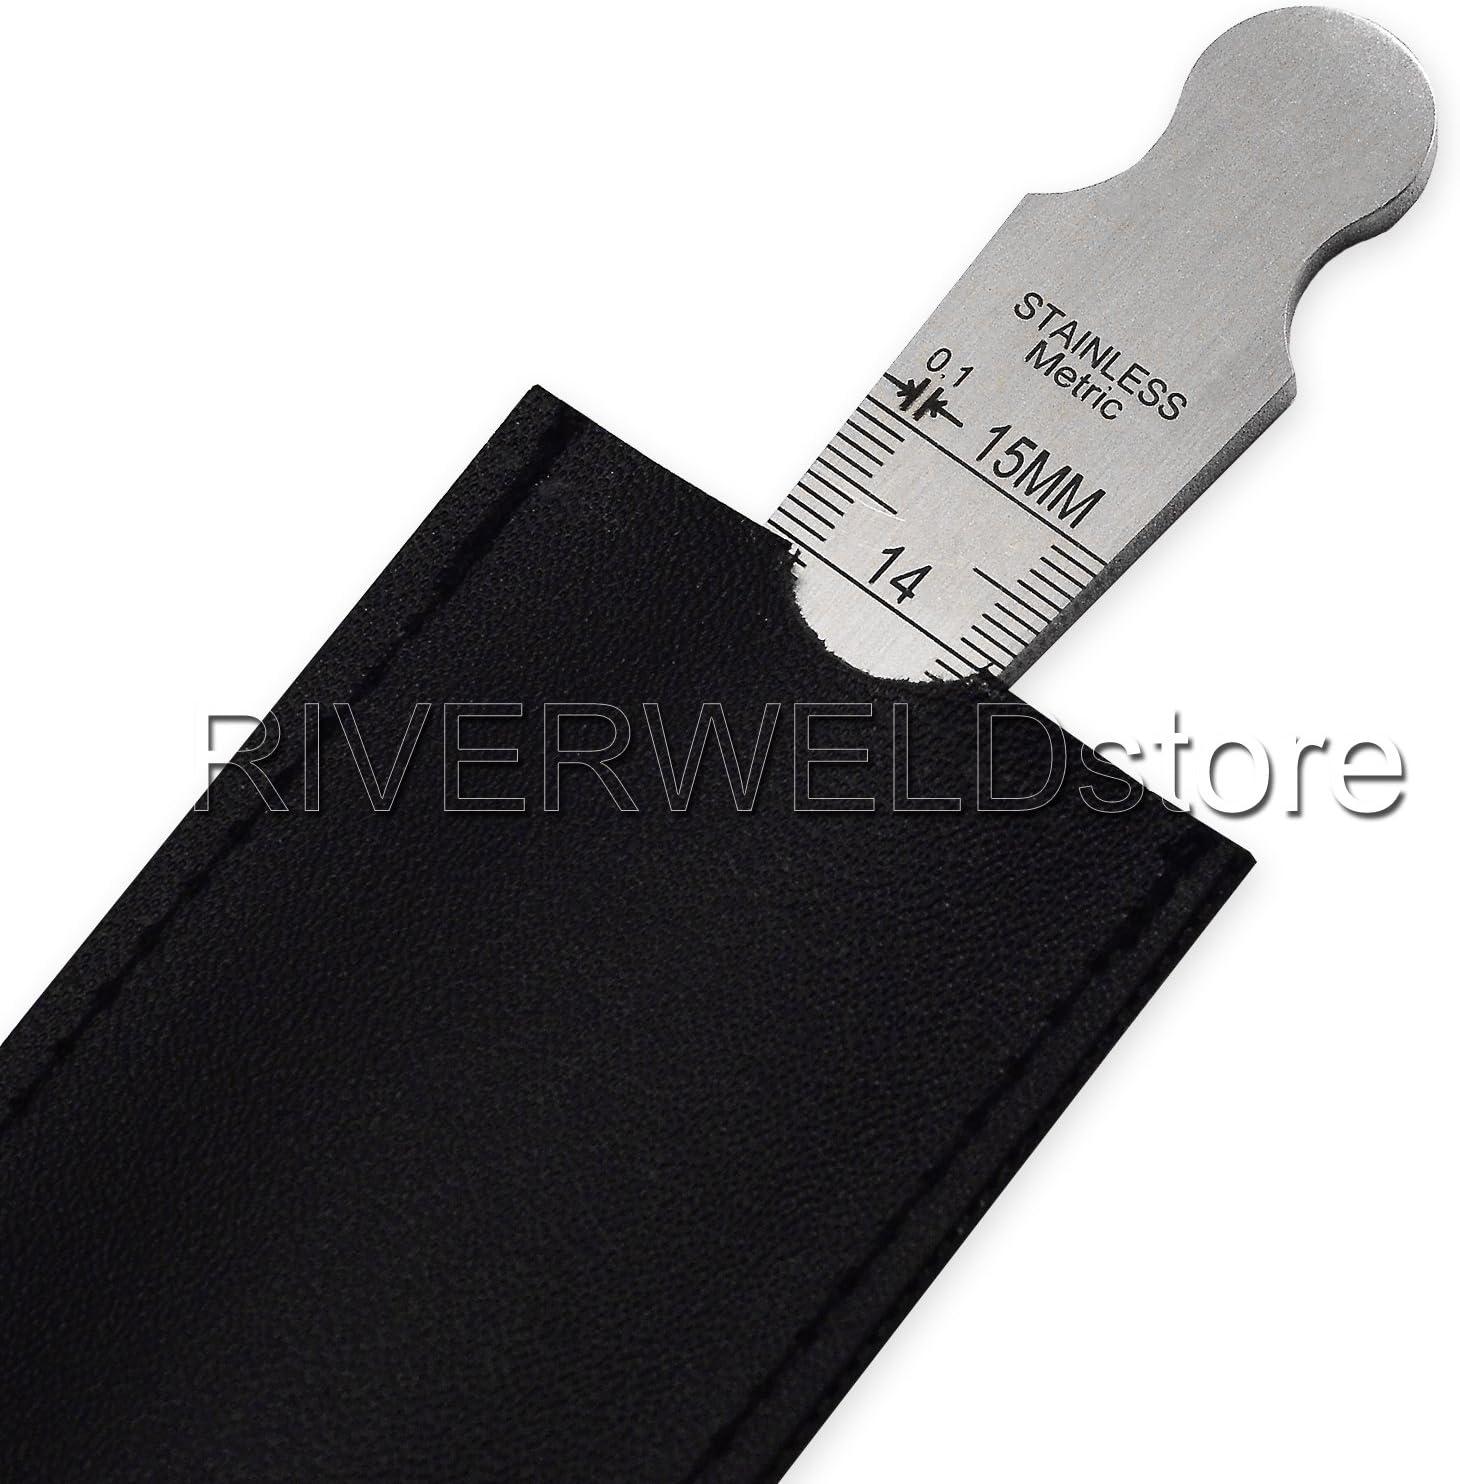 RIVERWELD Taper Gage 1-15mm Stainless Taper Welding Gauge Test Ulnar Inch /& Metric Standard RIVERWELDstore